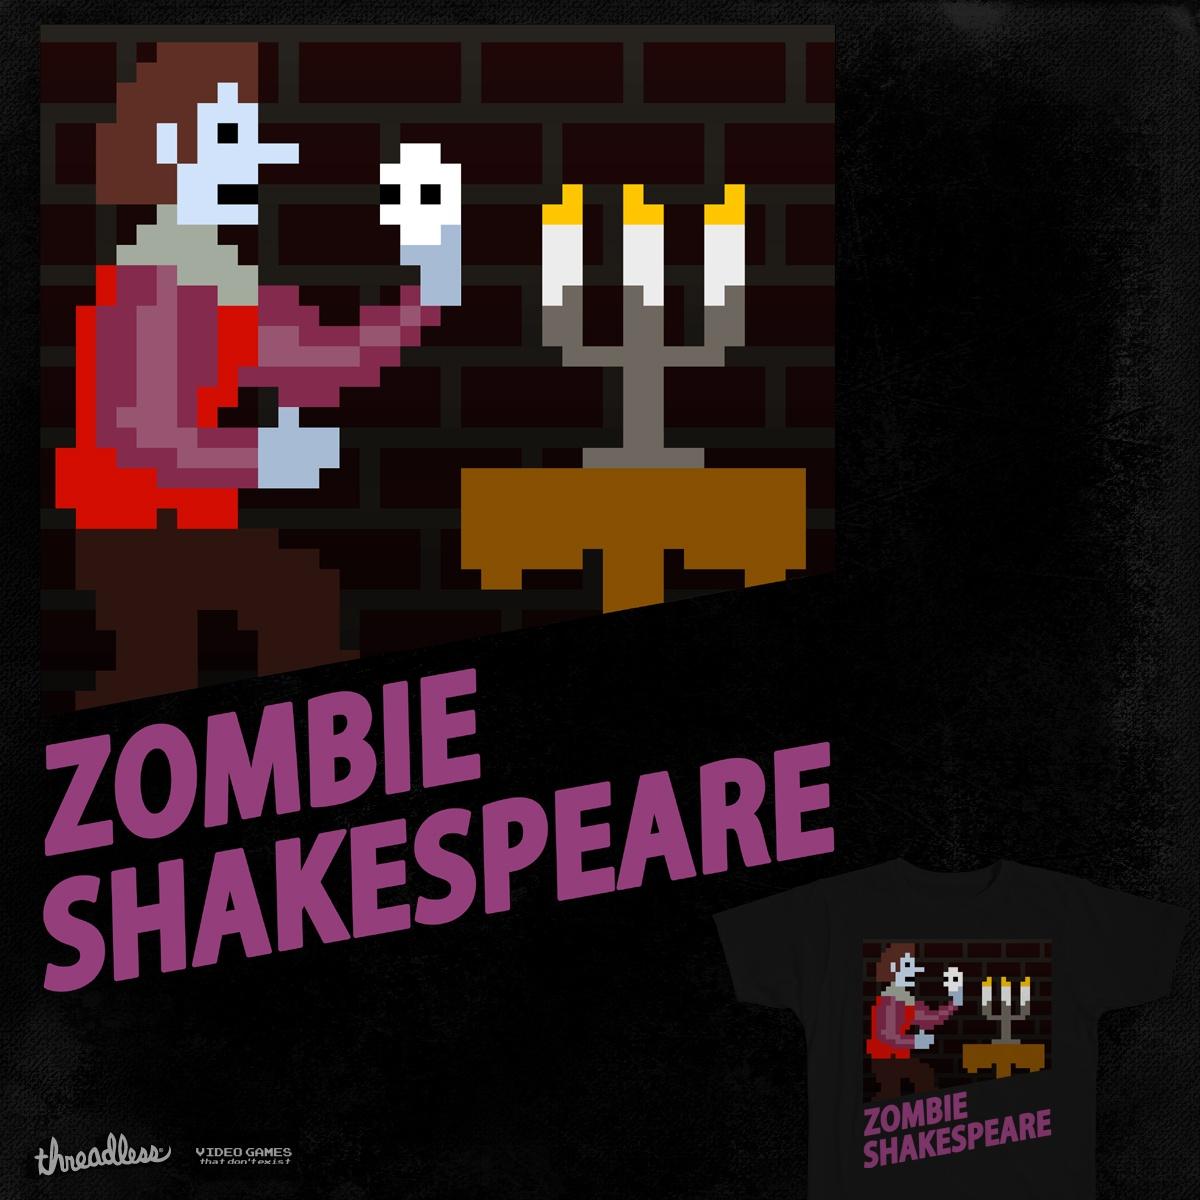 Zombie Shakespeare by mattographer on Threadless